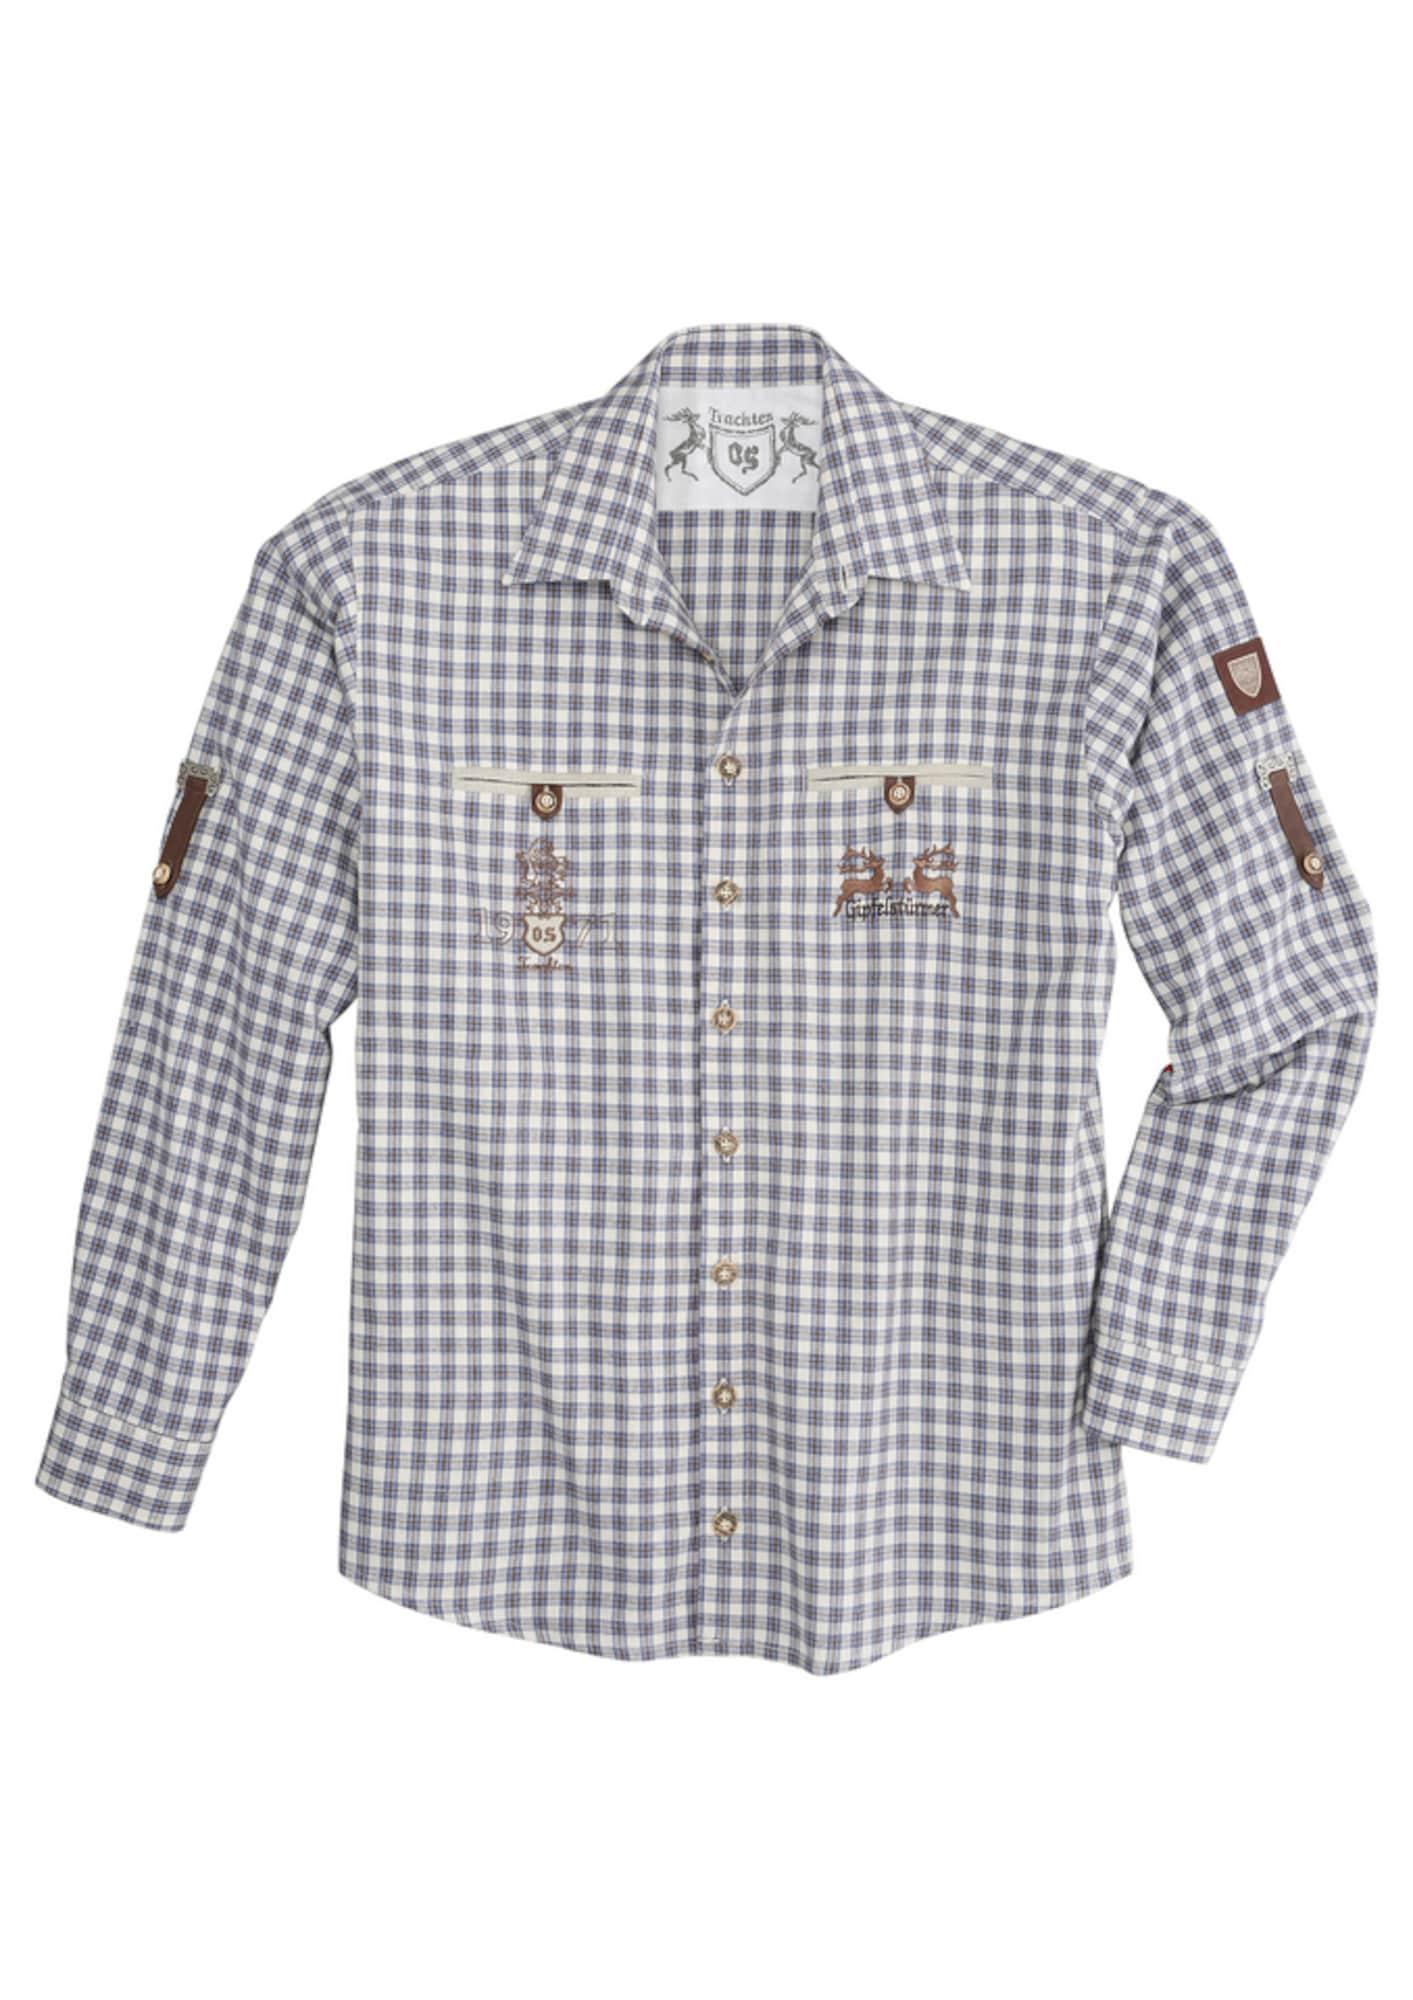 Trachtenhemd in Flanelloptik   Bekleidung > Hemden > Trachtenhemden   Lila - Weiß   OS-TRACHTEN